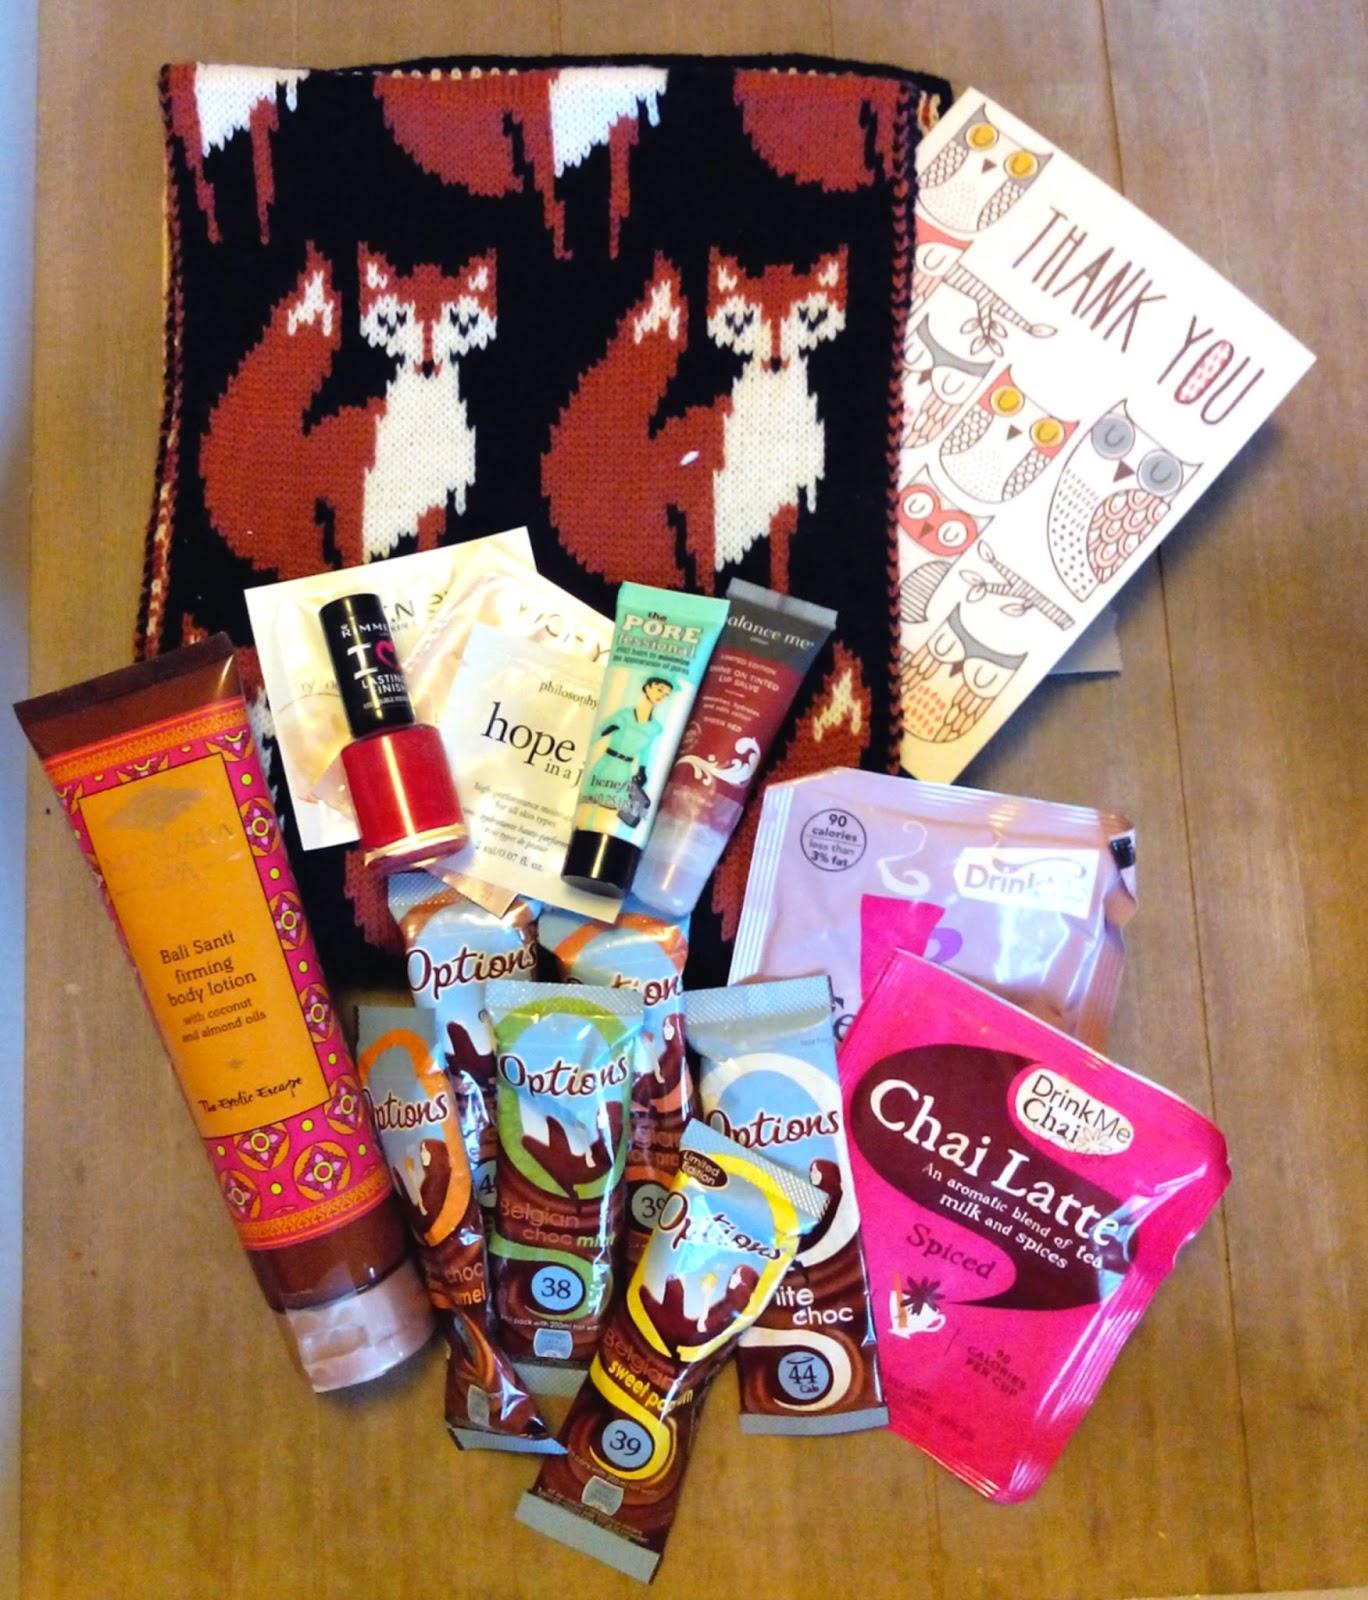 renard, écharpe, chocolat, cadeaux, bullelodie